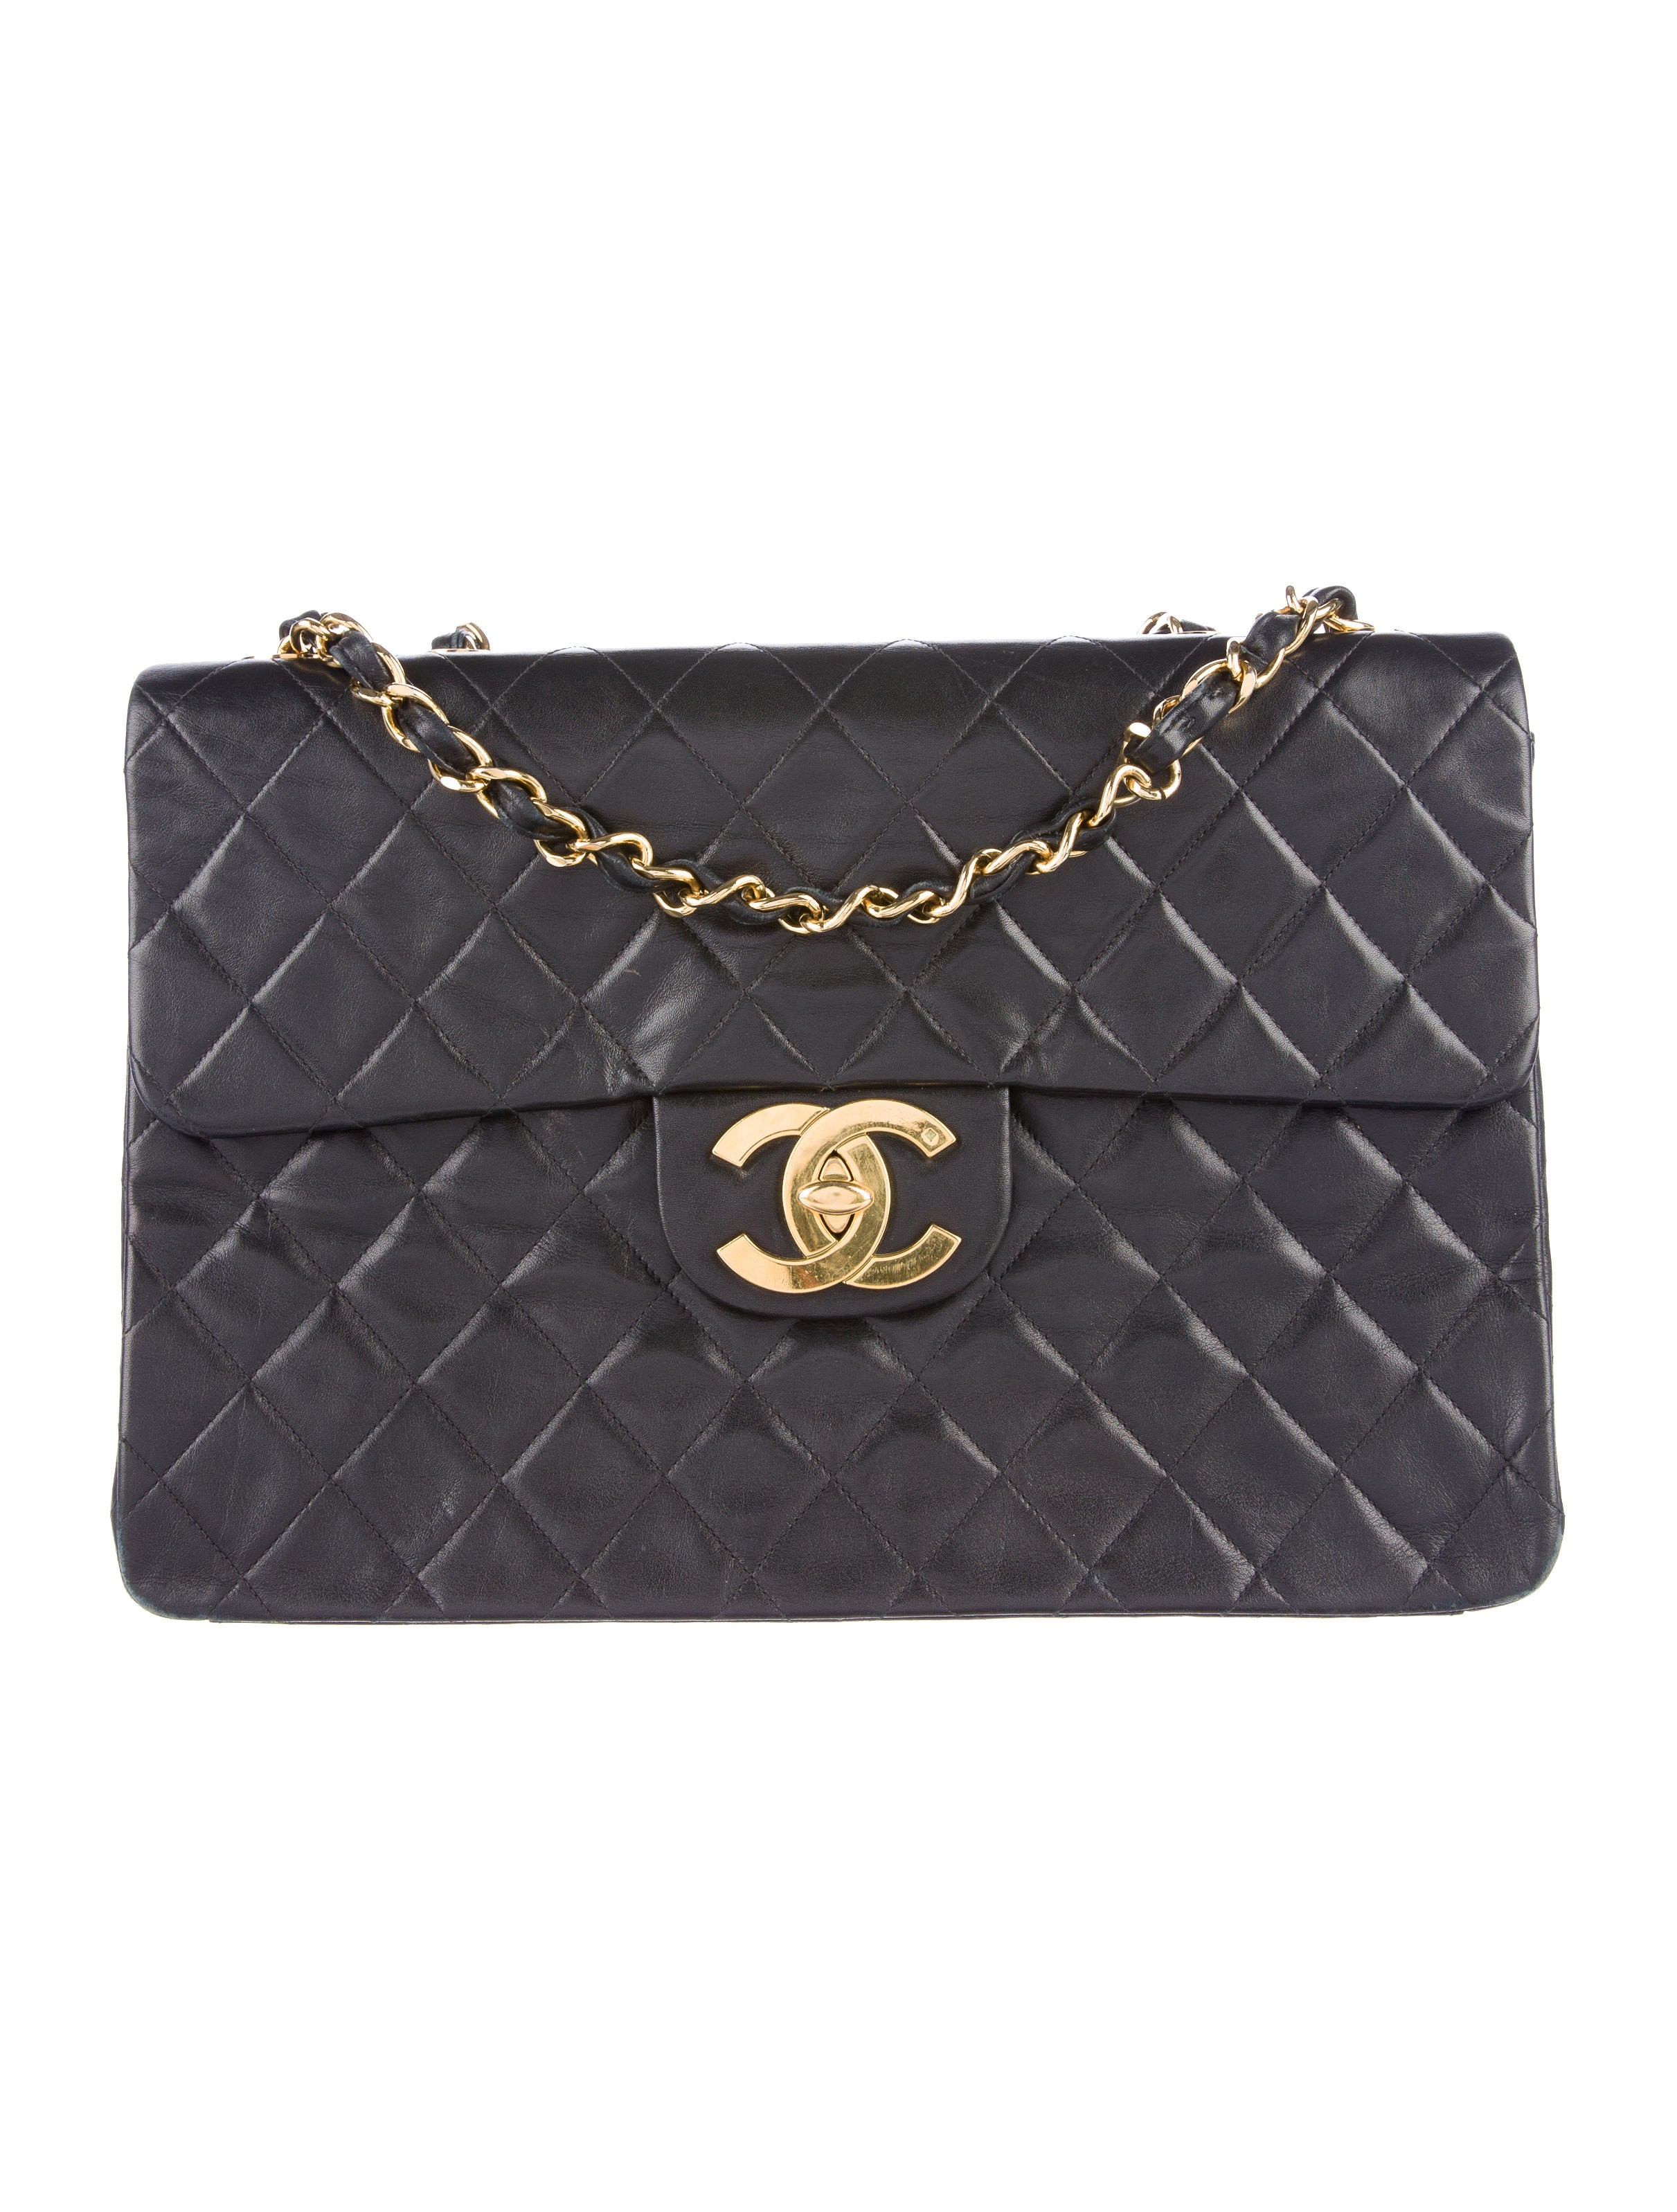 Chanel Vintage Classic Maxi Single Flap Bag Handbags